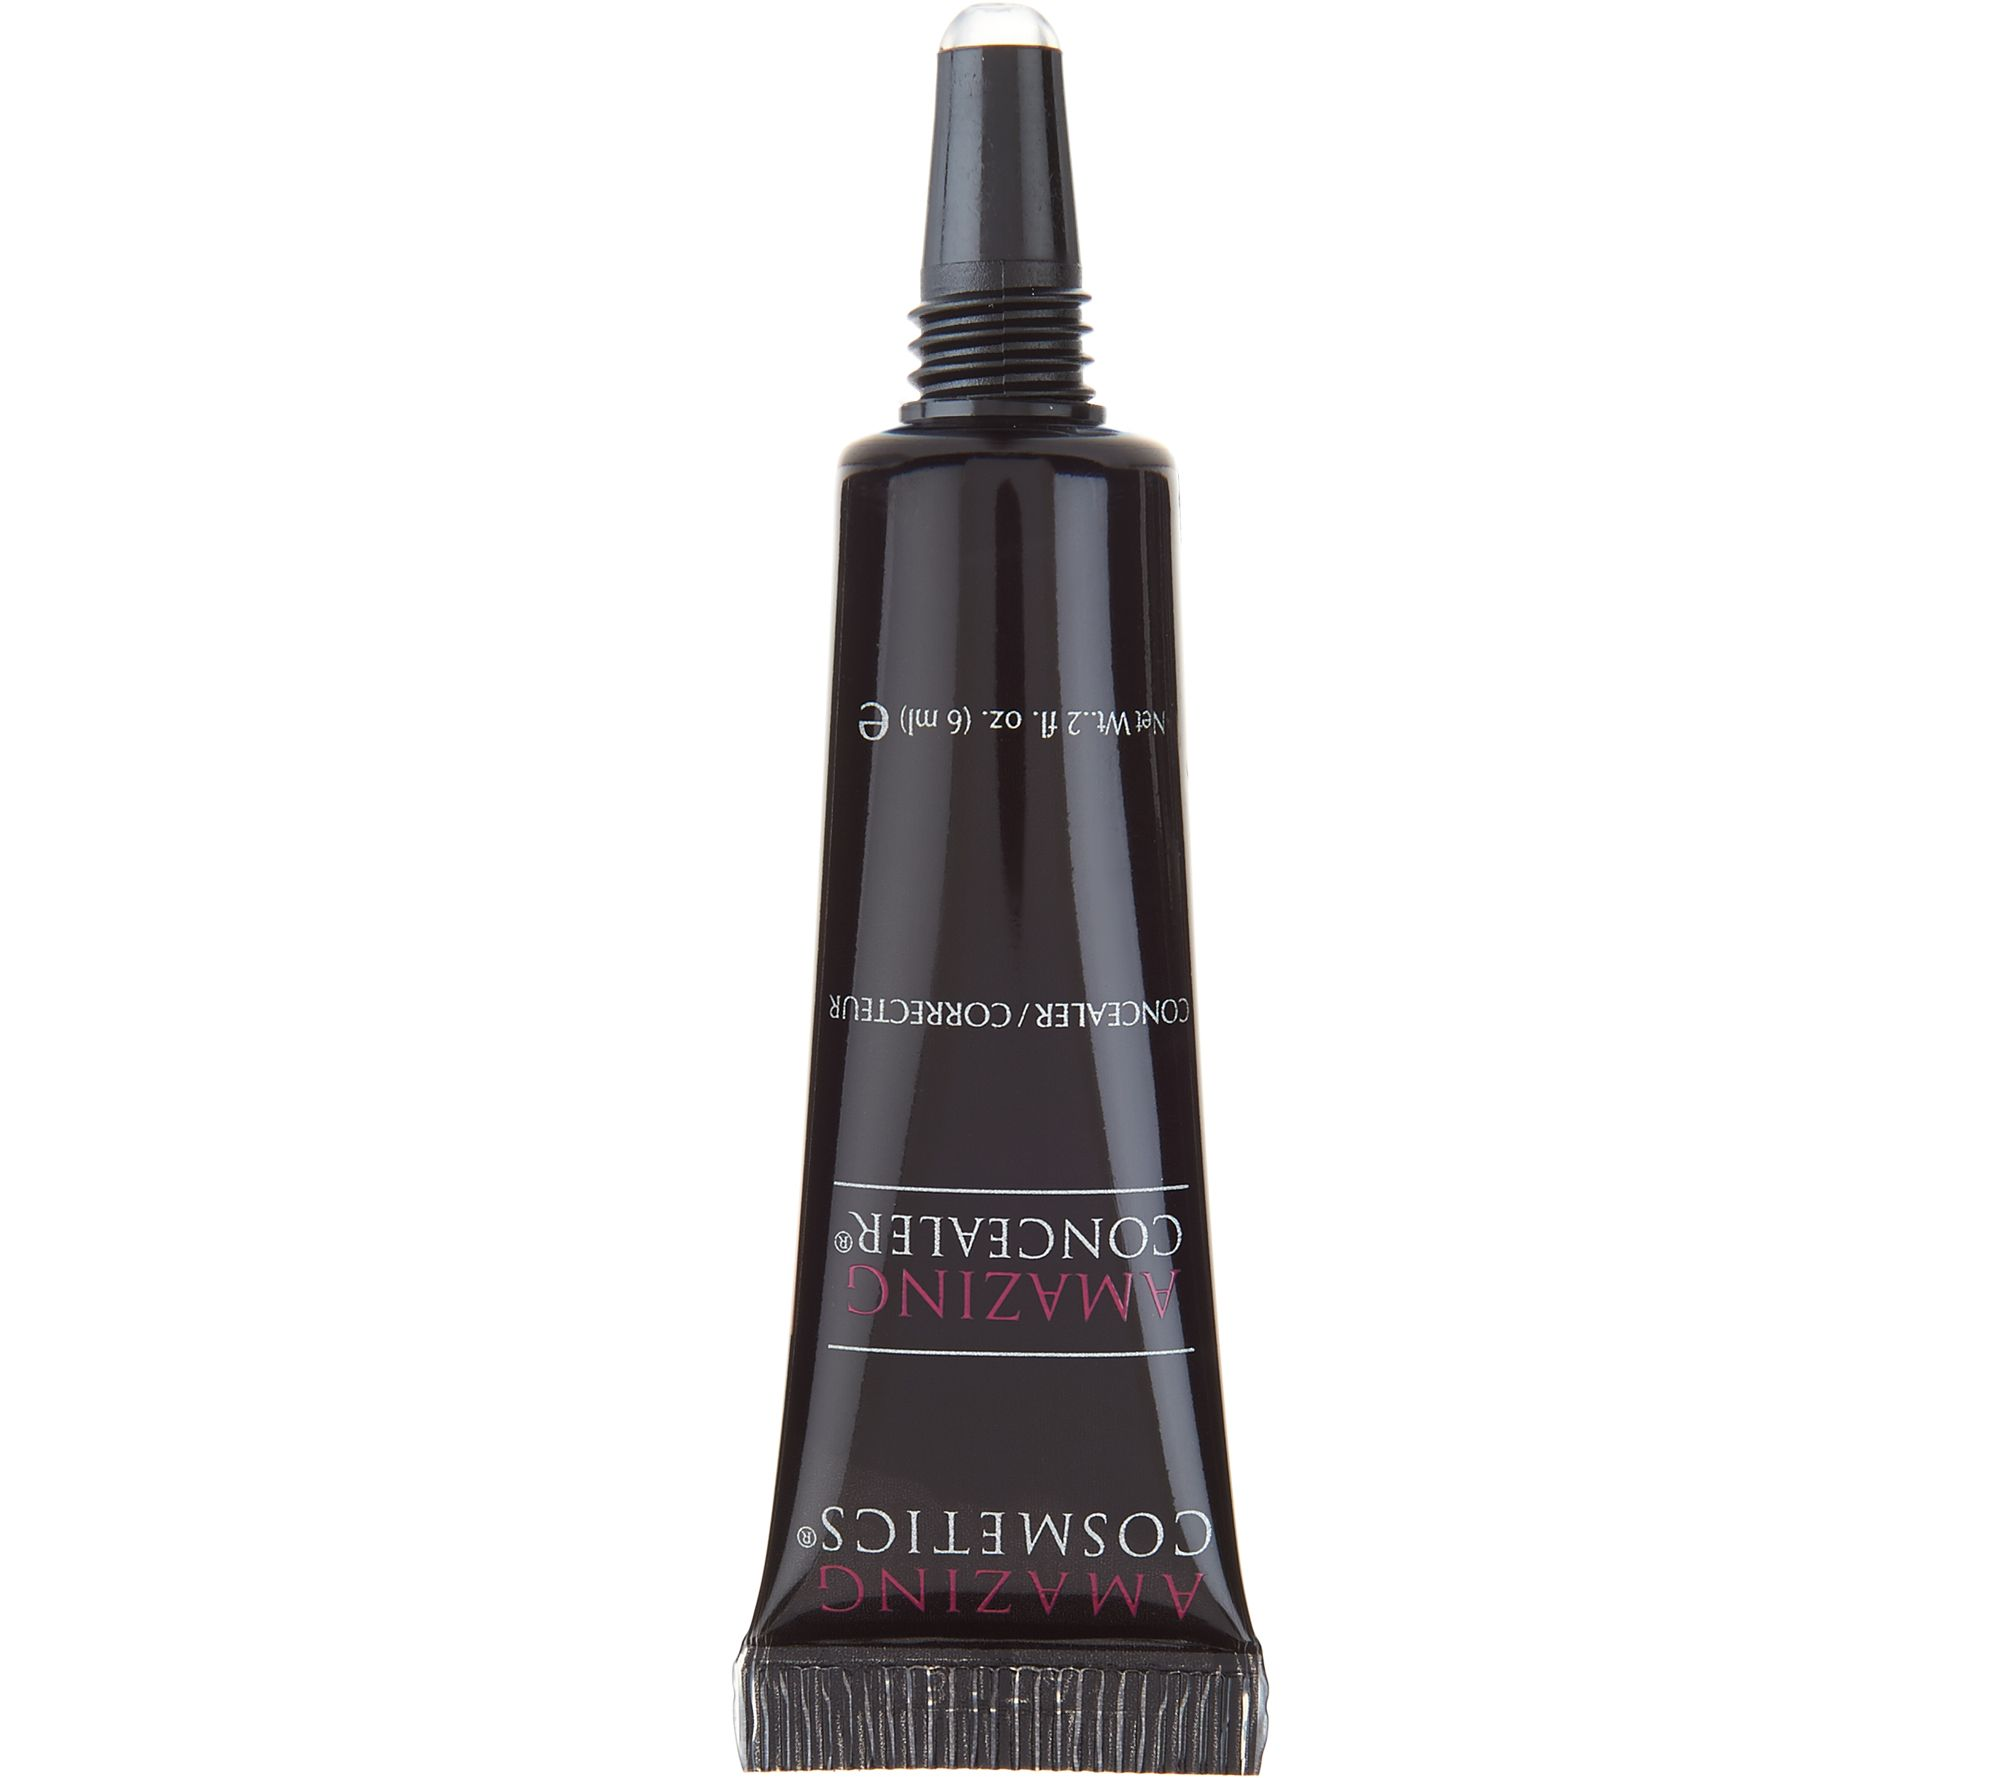 Velvet Mineral Powderset by Amazing Cosmetics #13